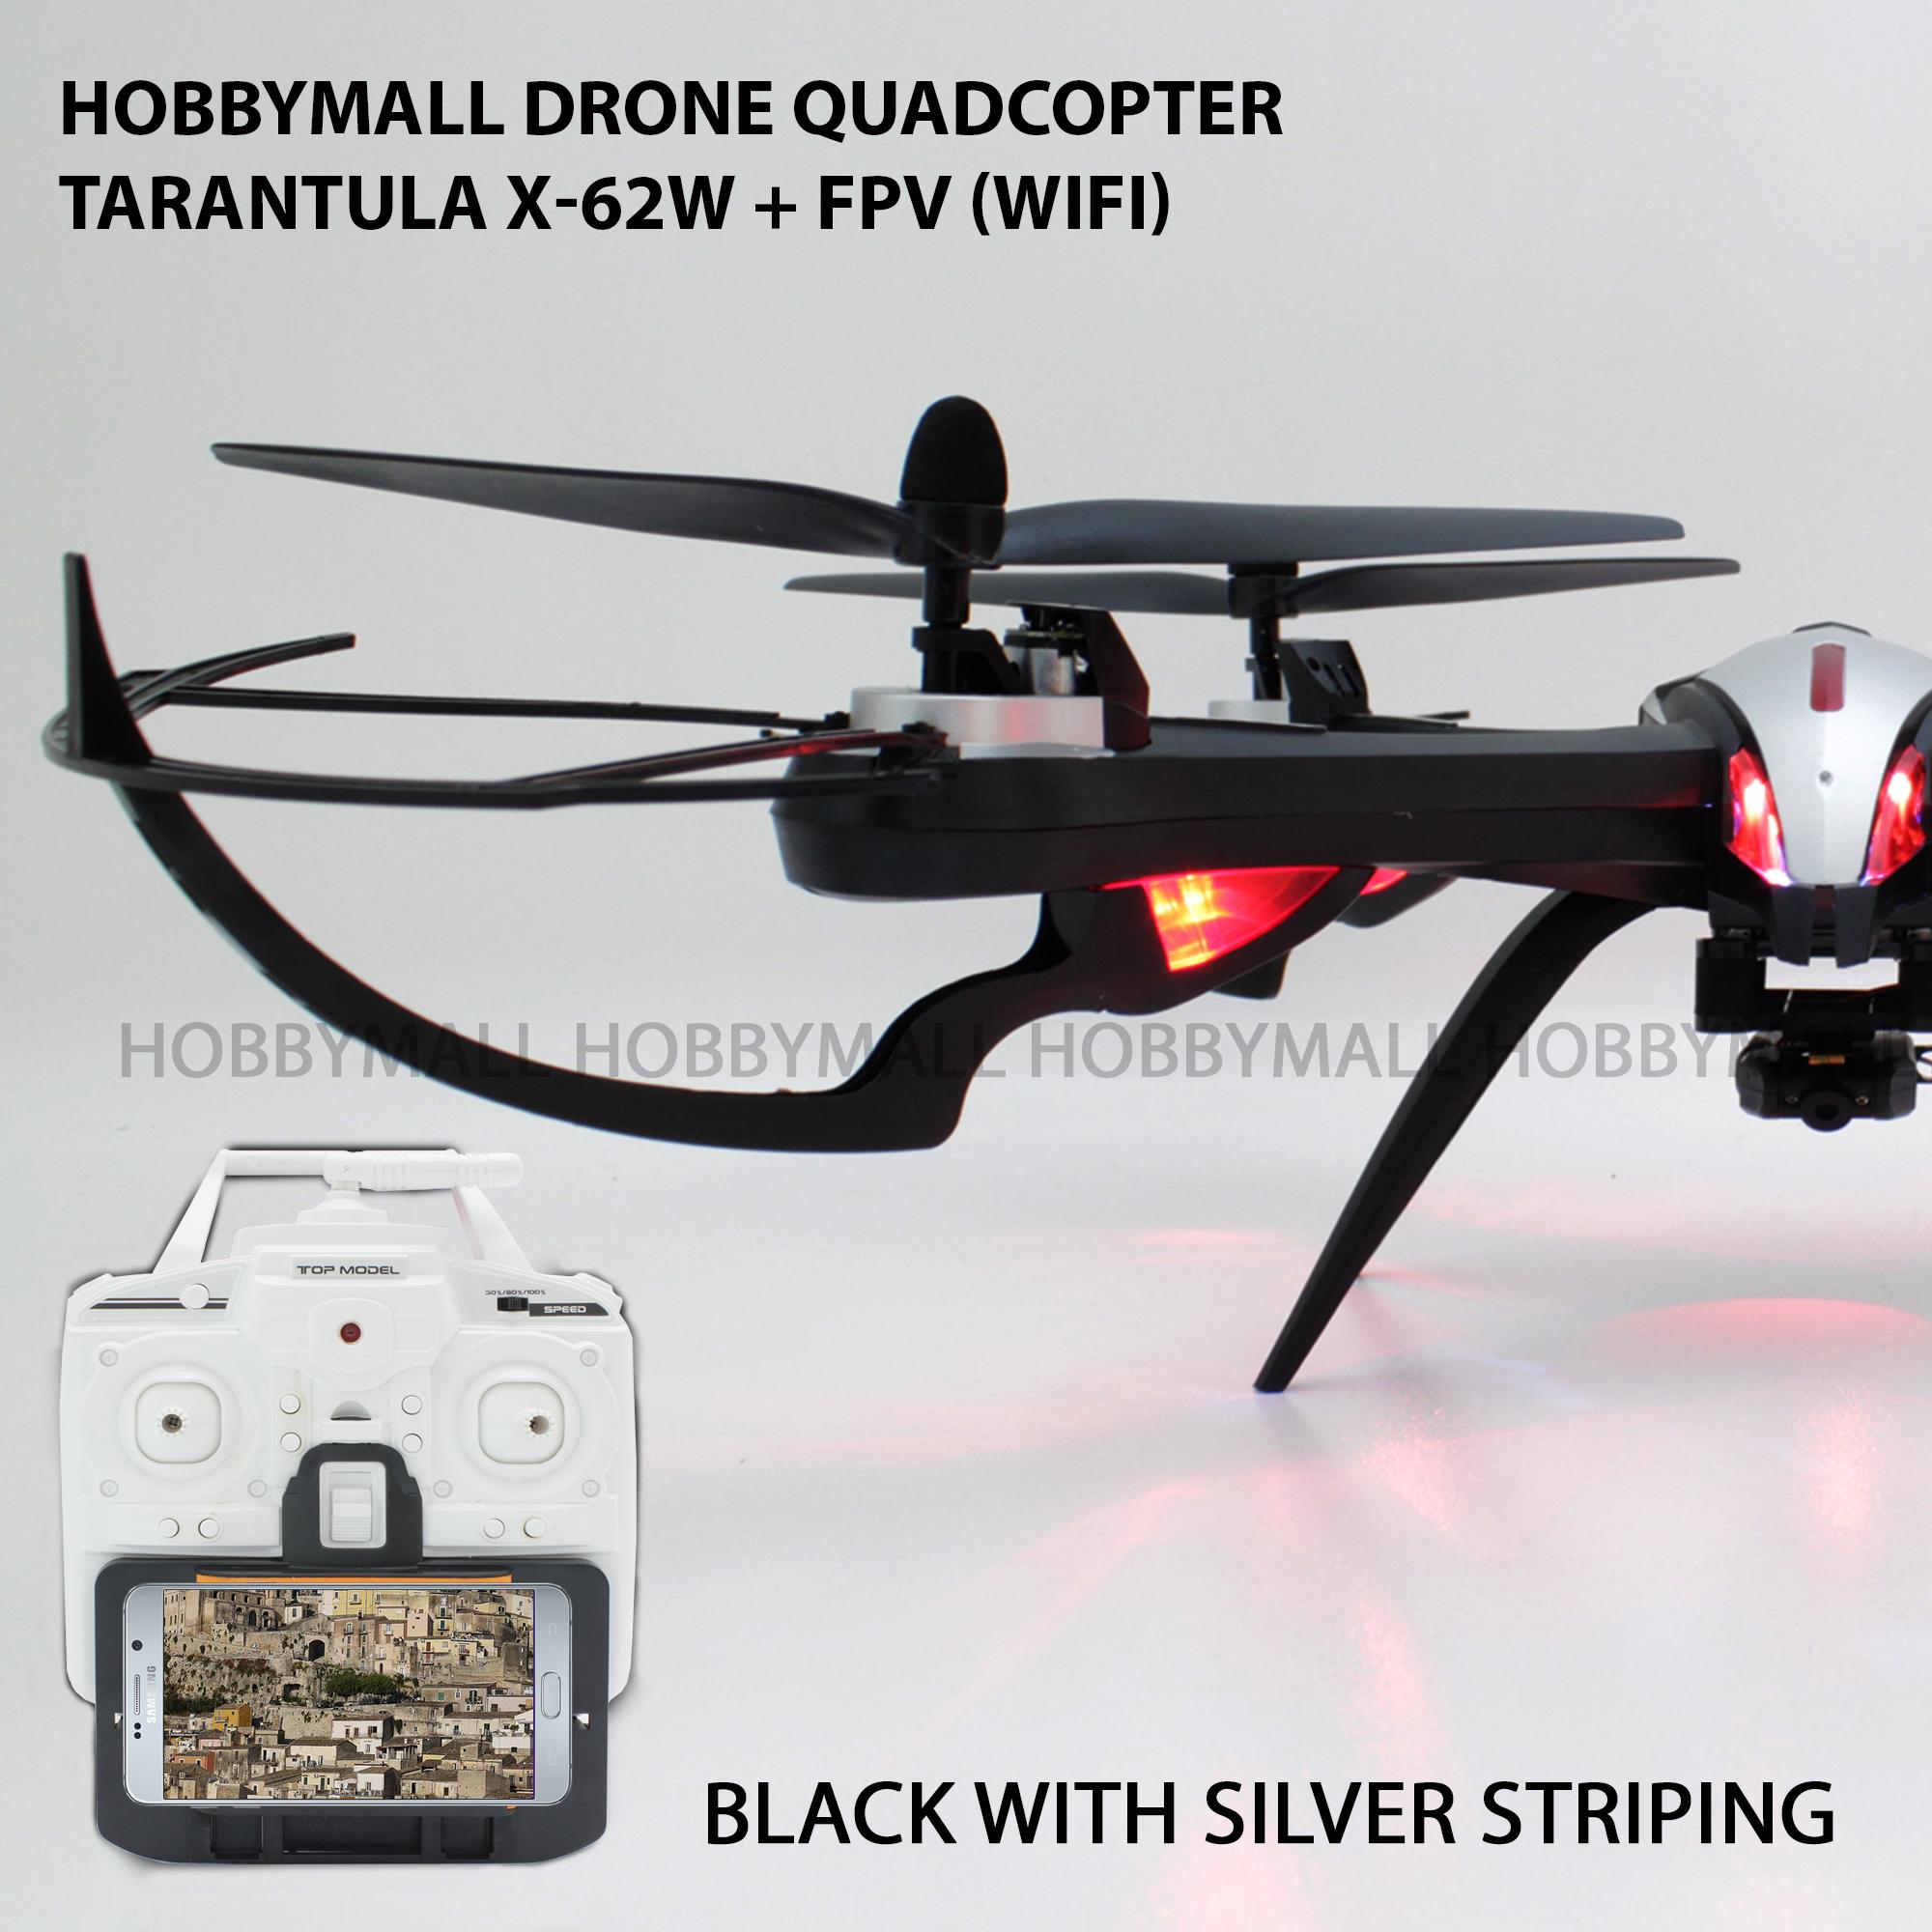 HOBBYMALL DRONE QUADCOPTER TARANTULA X-62 W + FPV(WIFI)